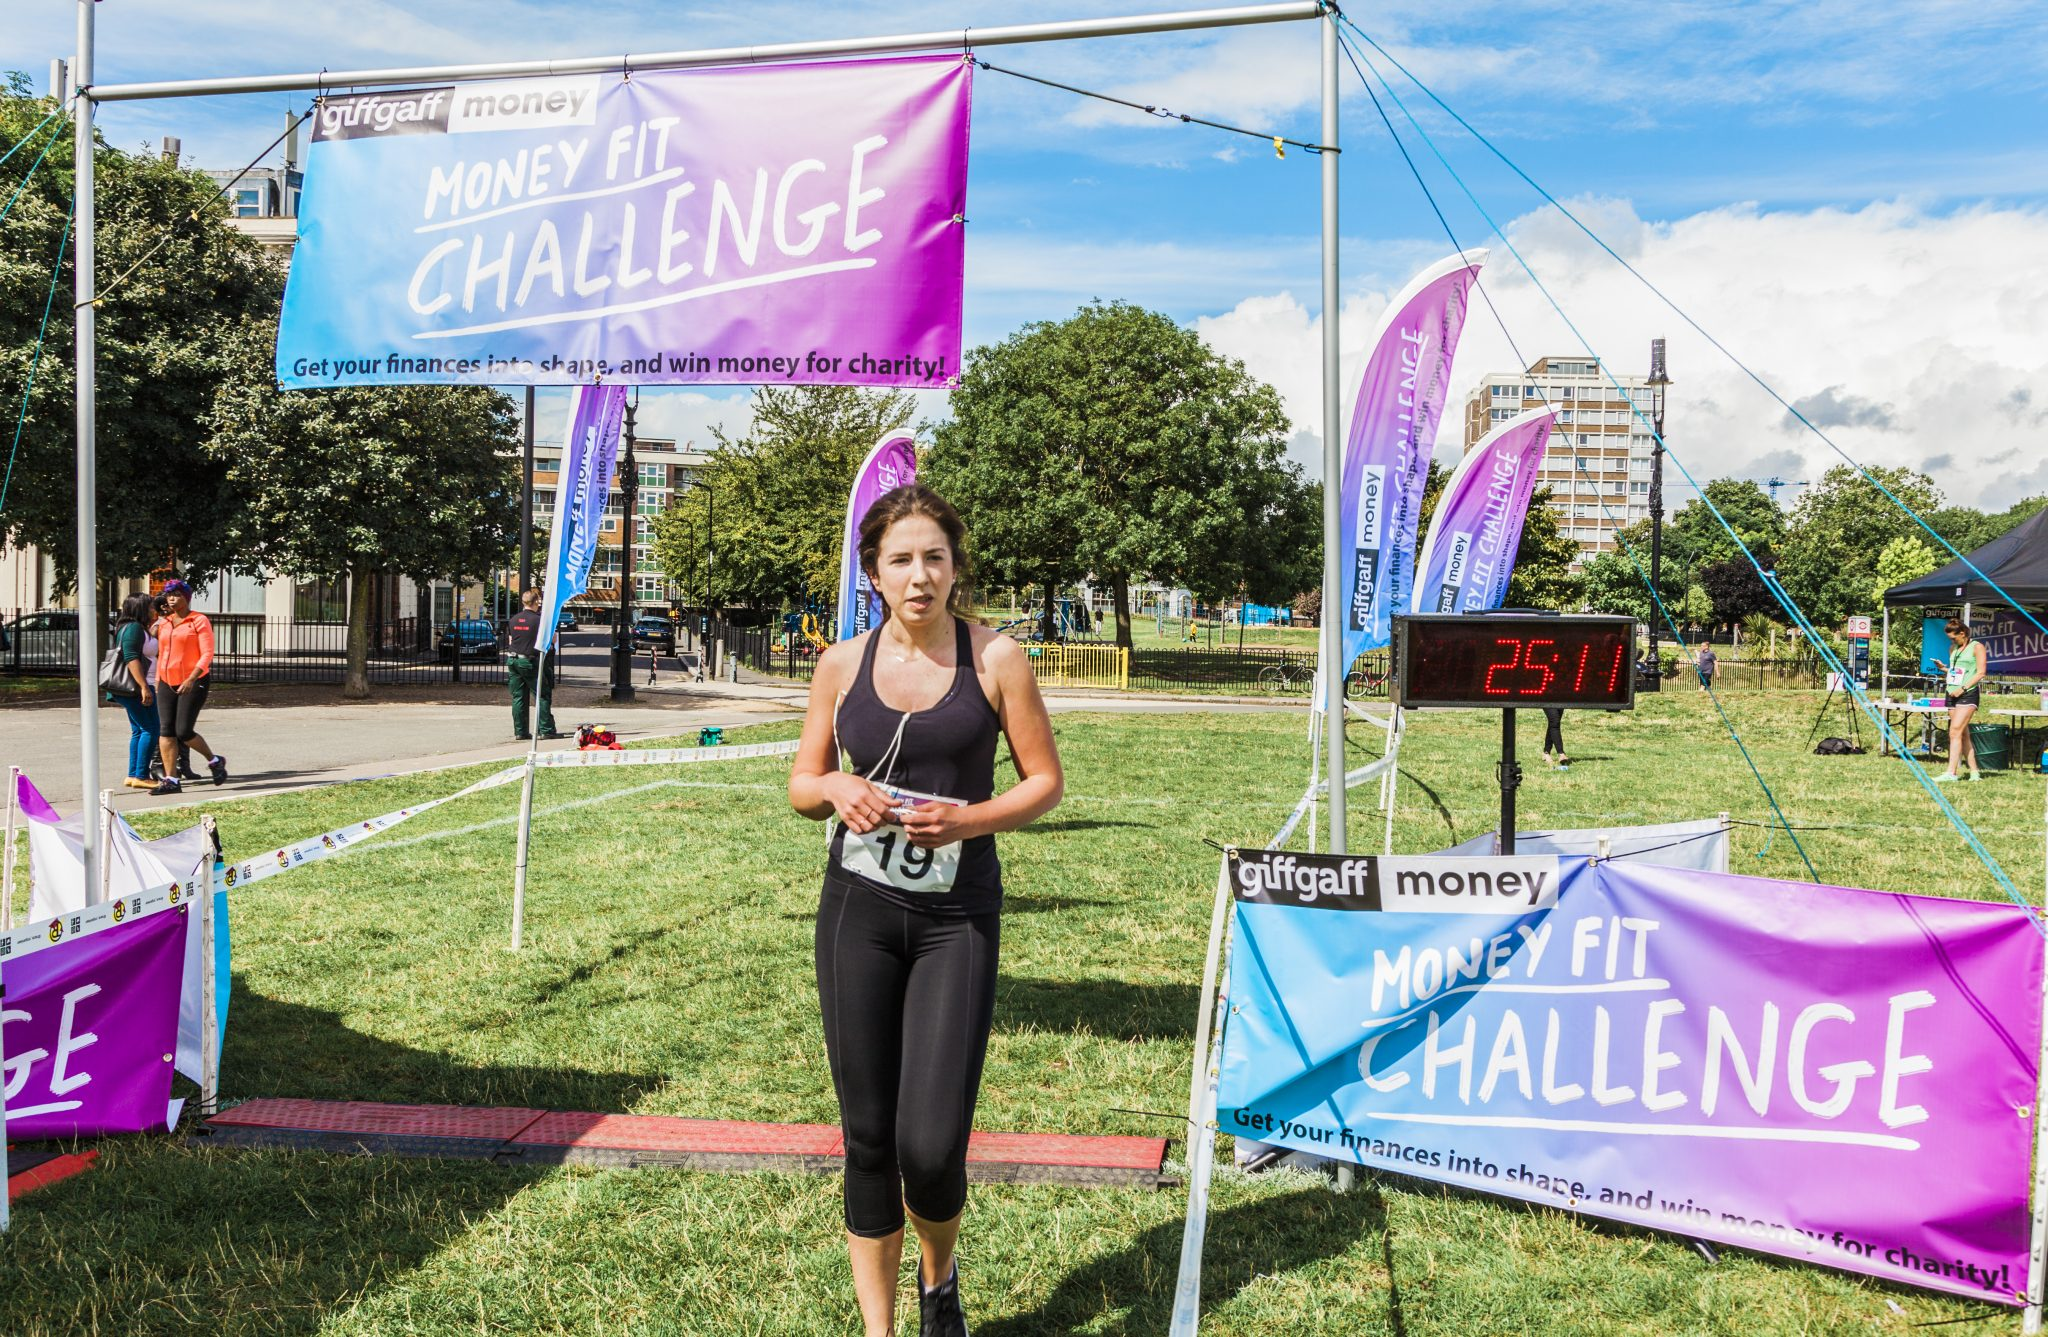 0052 Finish Line - Giff Gaff Money Fit Challenge